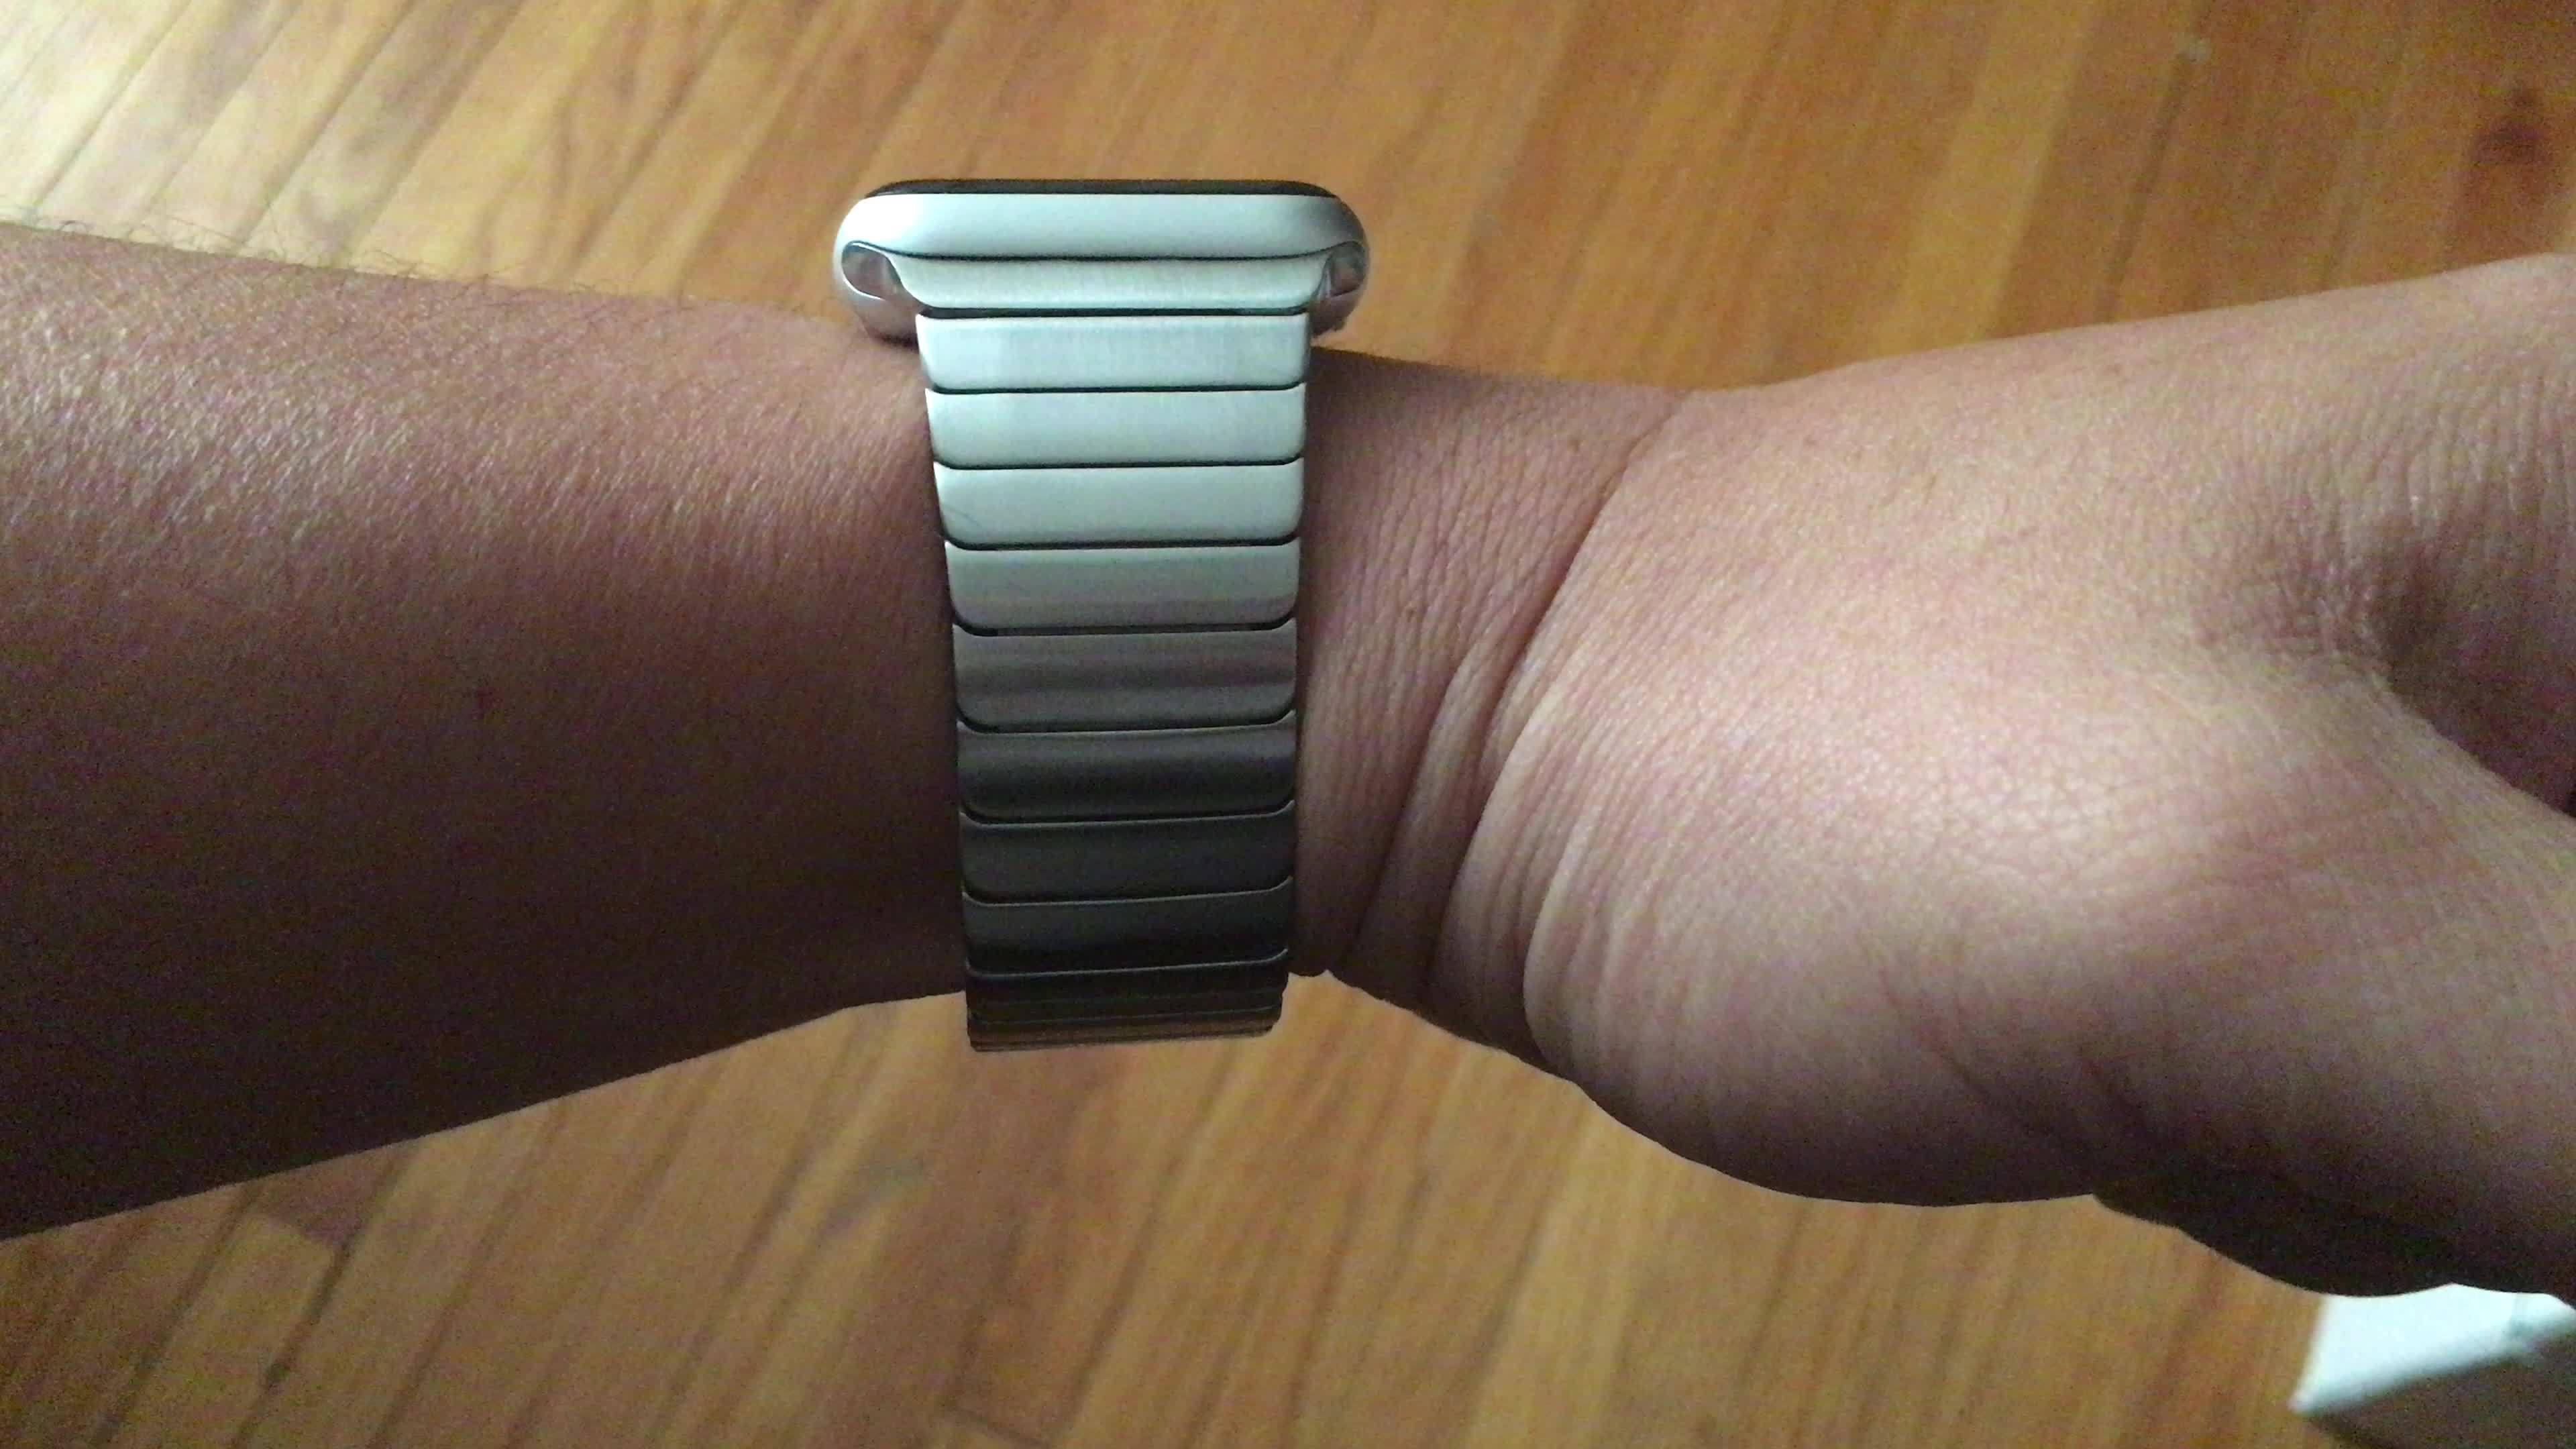 applewatch, dezign999, psylocke, Dezign999 Psylock Apple Watch GIFs